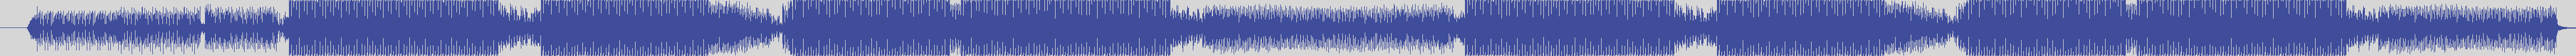 hitaly_muzik [smile1057] Hitaly Crew - Fortaleza [Original Mix] audio wave form